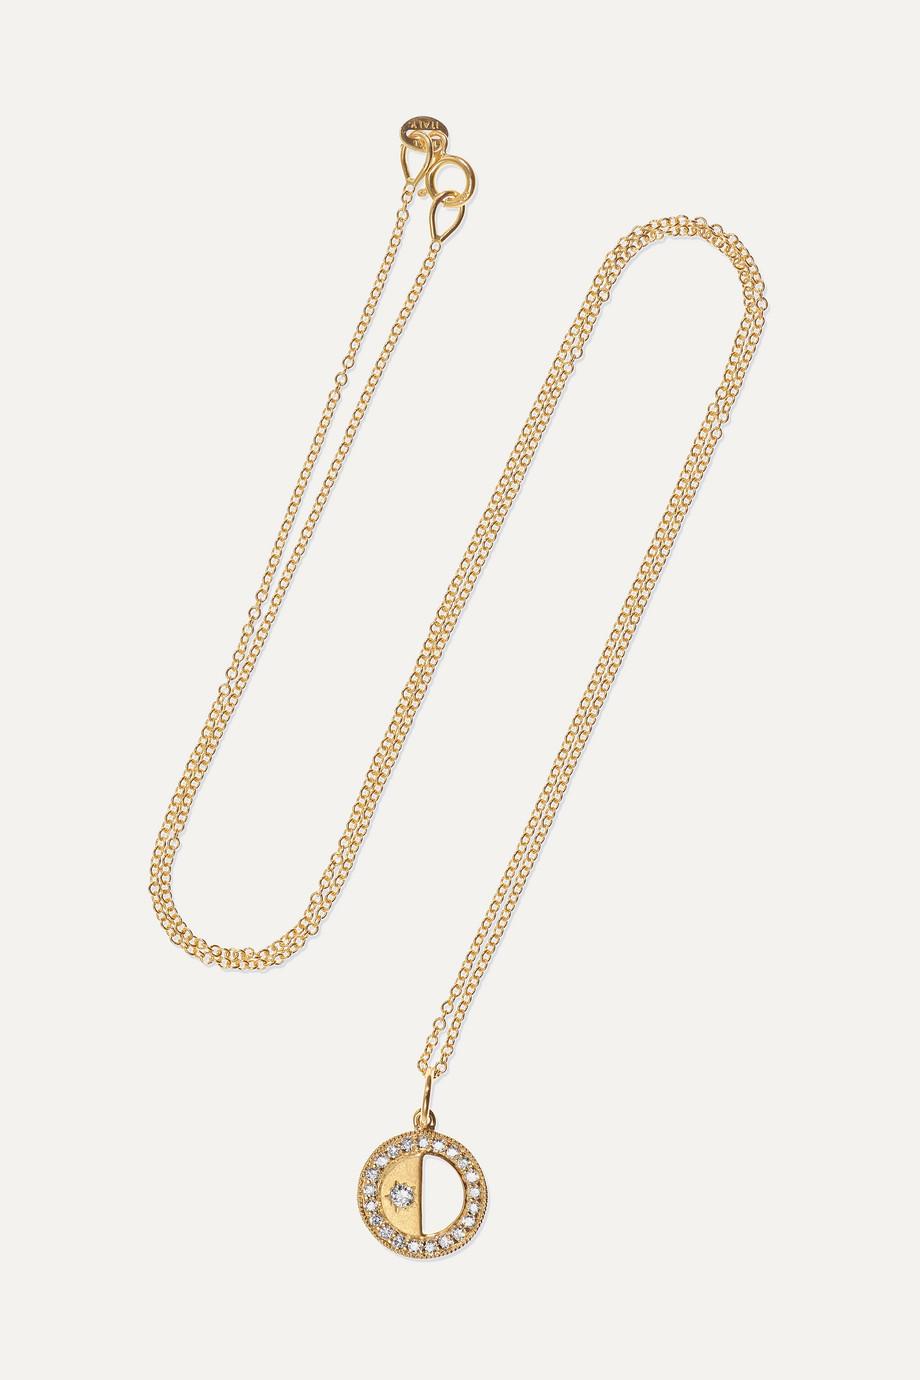 Andrea Fohrman Half Moon 18-karat gold diamond necklace